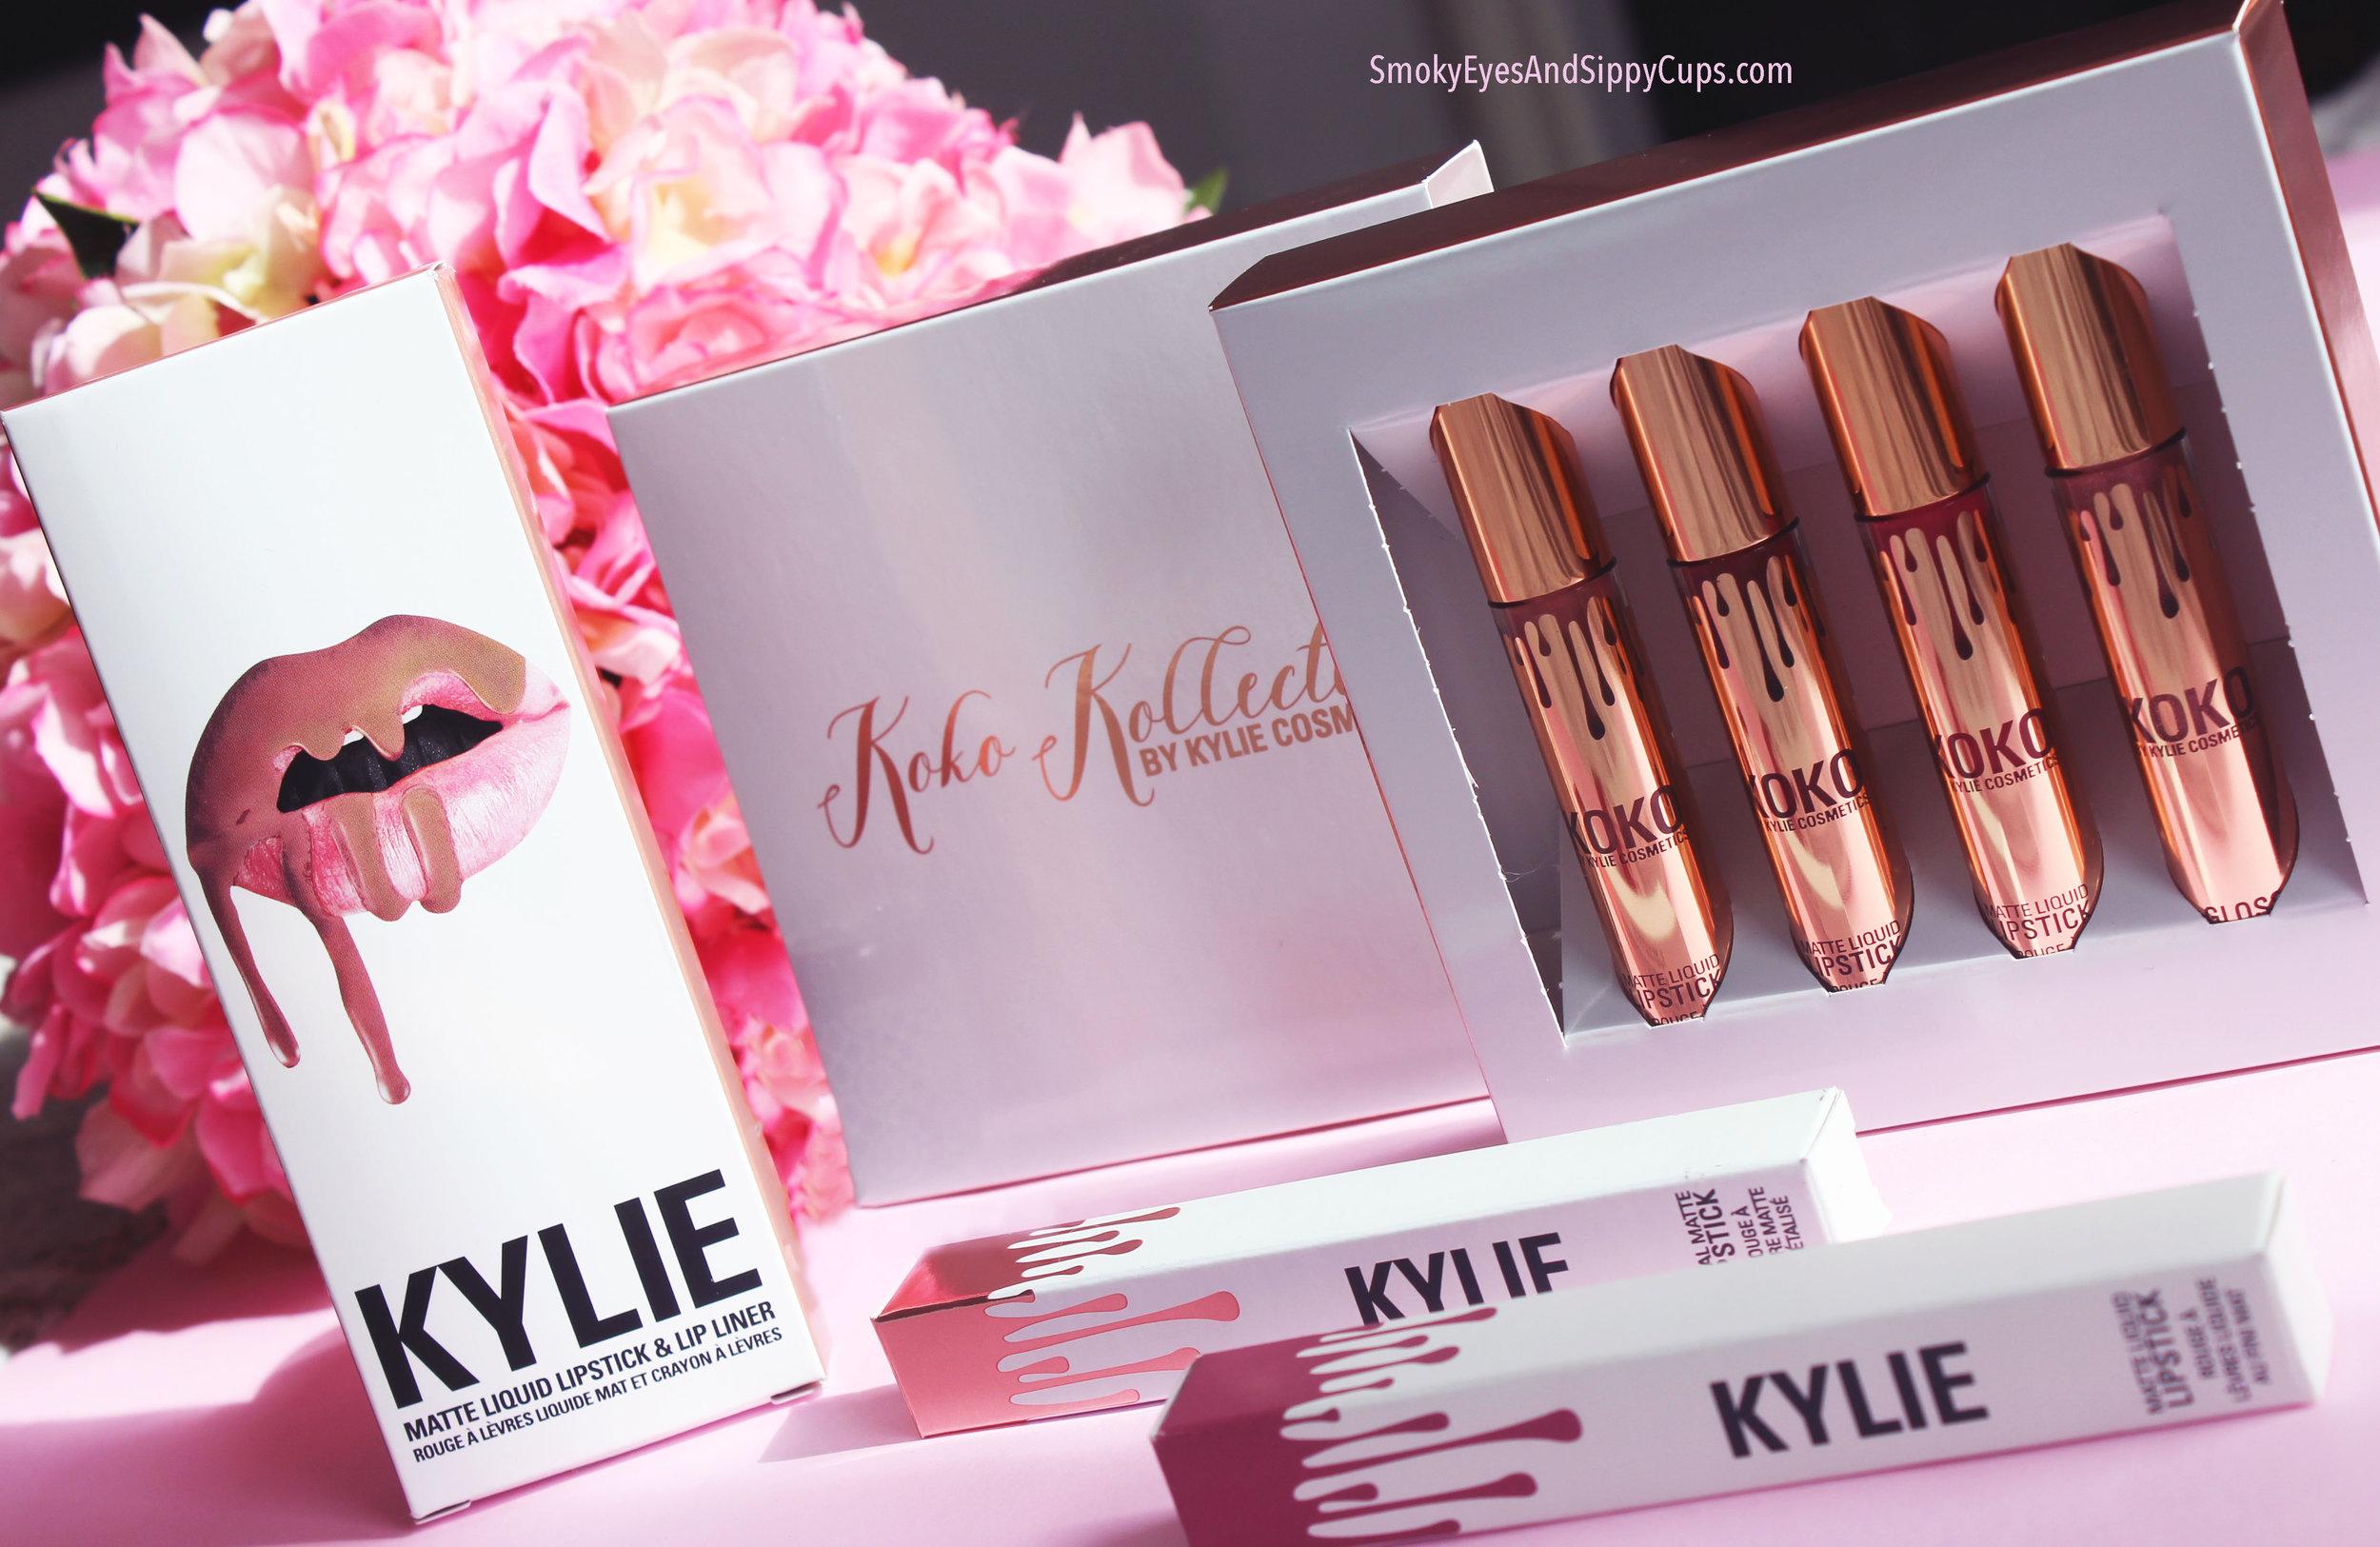 Kylie Jenner Lipkit Haul Khloe Kardashian kit